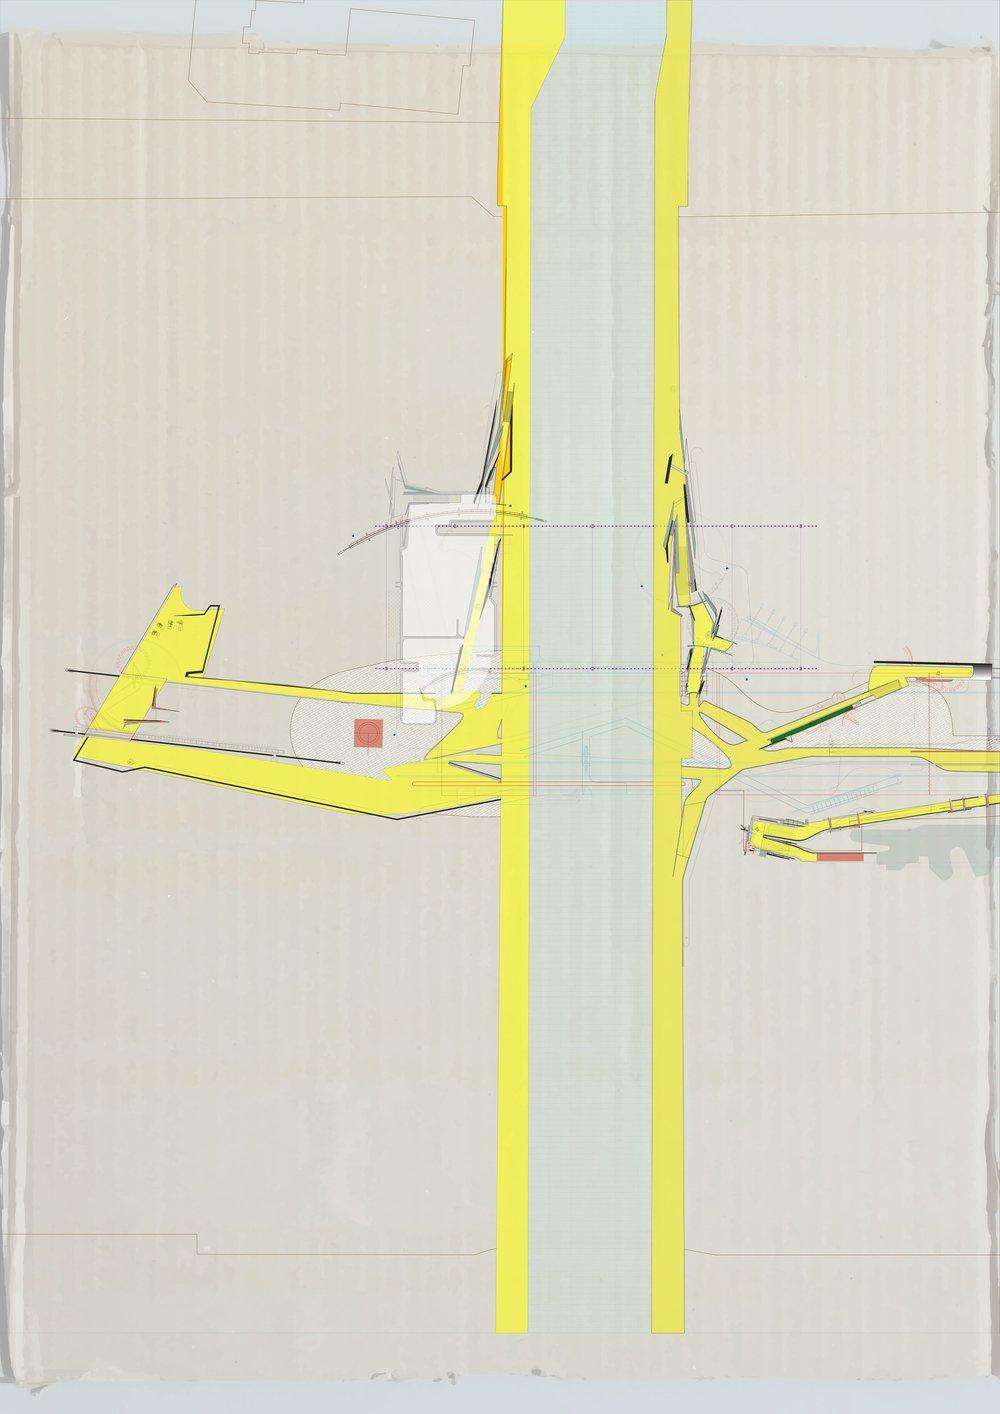 plan_island-_03_ileauxcygnes_paris_film_studio_complex_y3-01-min.jpg